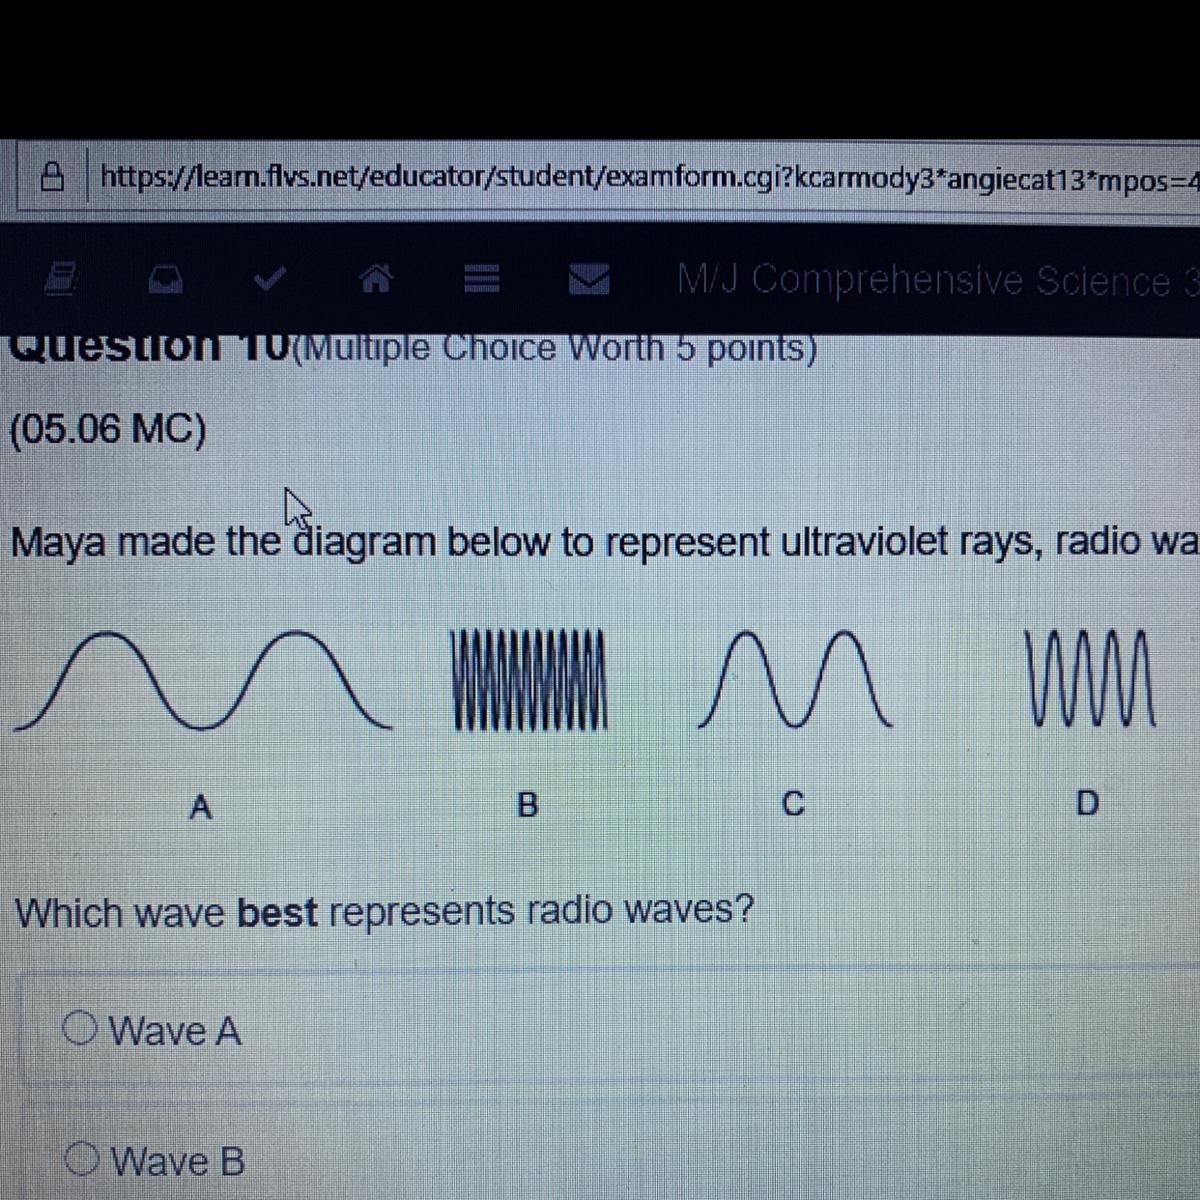 Maya Made The Diagram Below To Represent Ultraviolet Rays